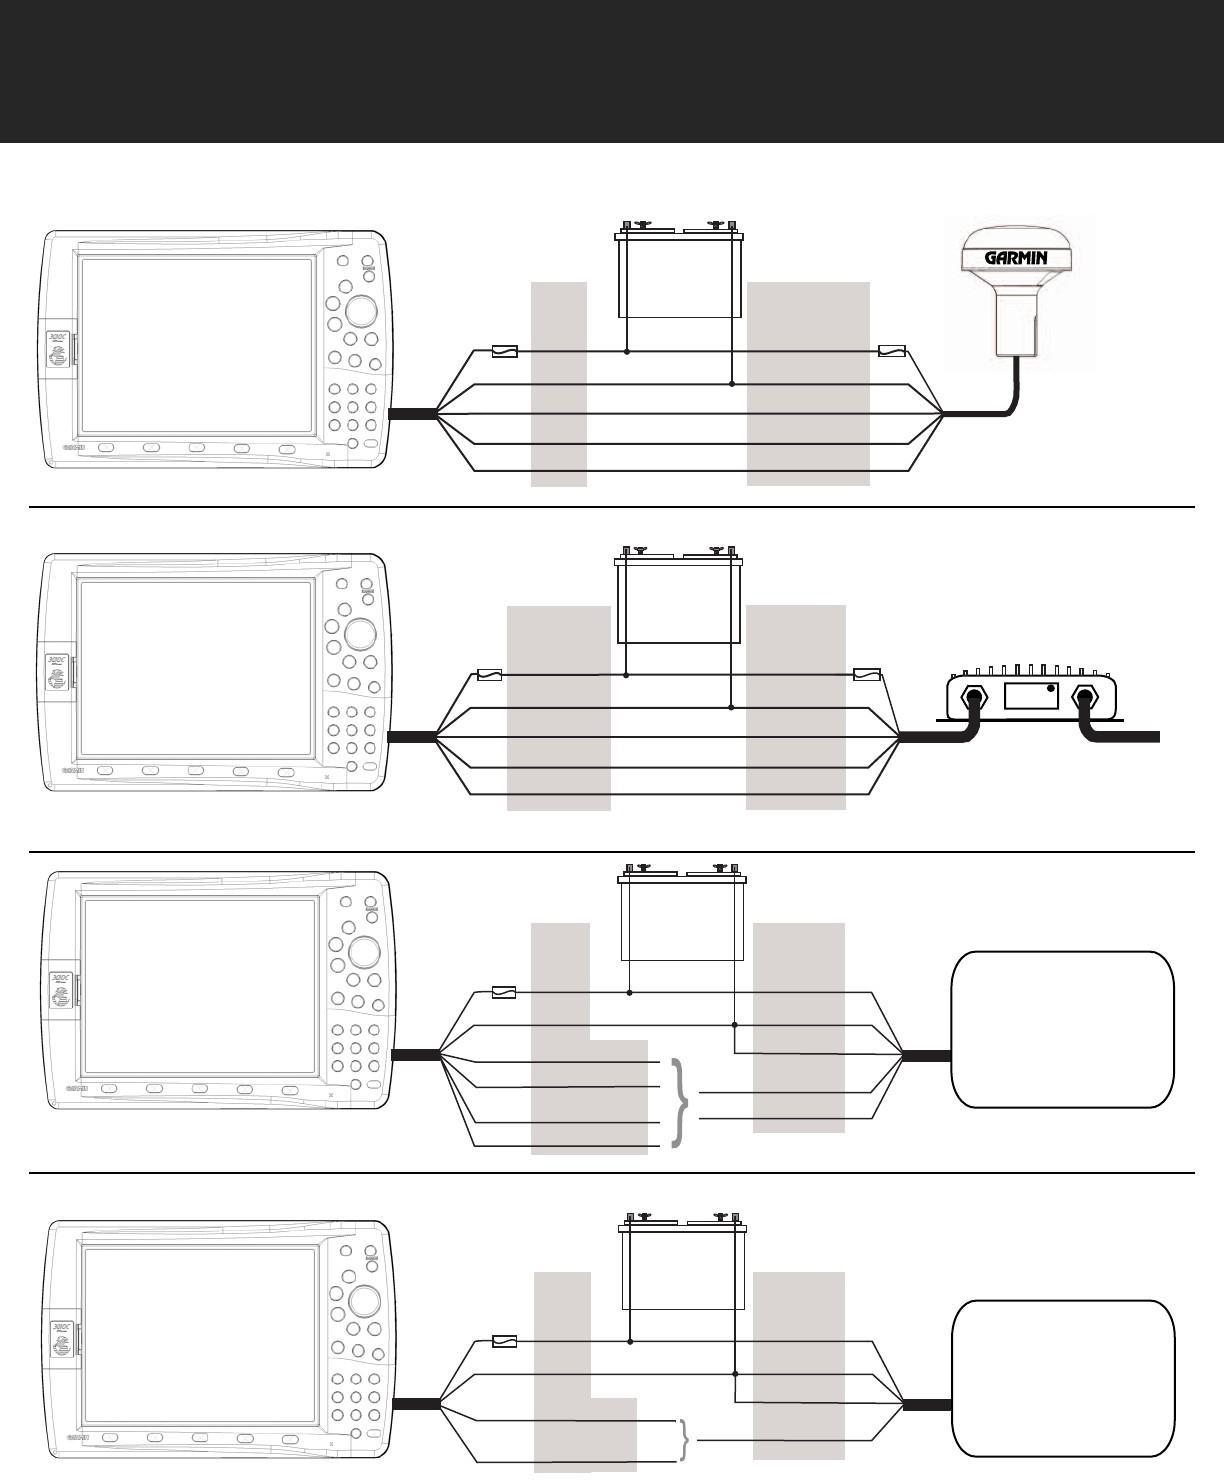 Garmin 3010c Wiring Diagram 17 - Wiring Diagram LN4 on garmin gpsmap wiring diagram, garmin radar wiring diagram, garmin nuvi wiring diagram, garmin 541s wiring diagram,